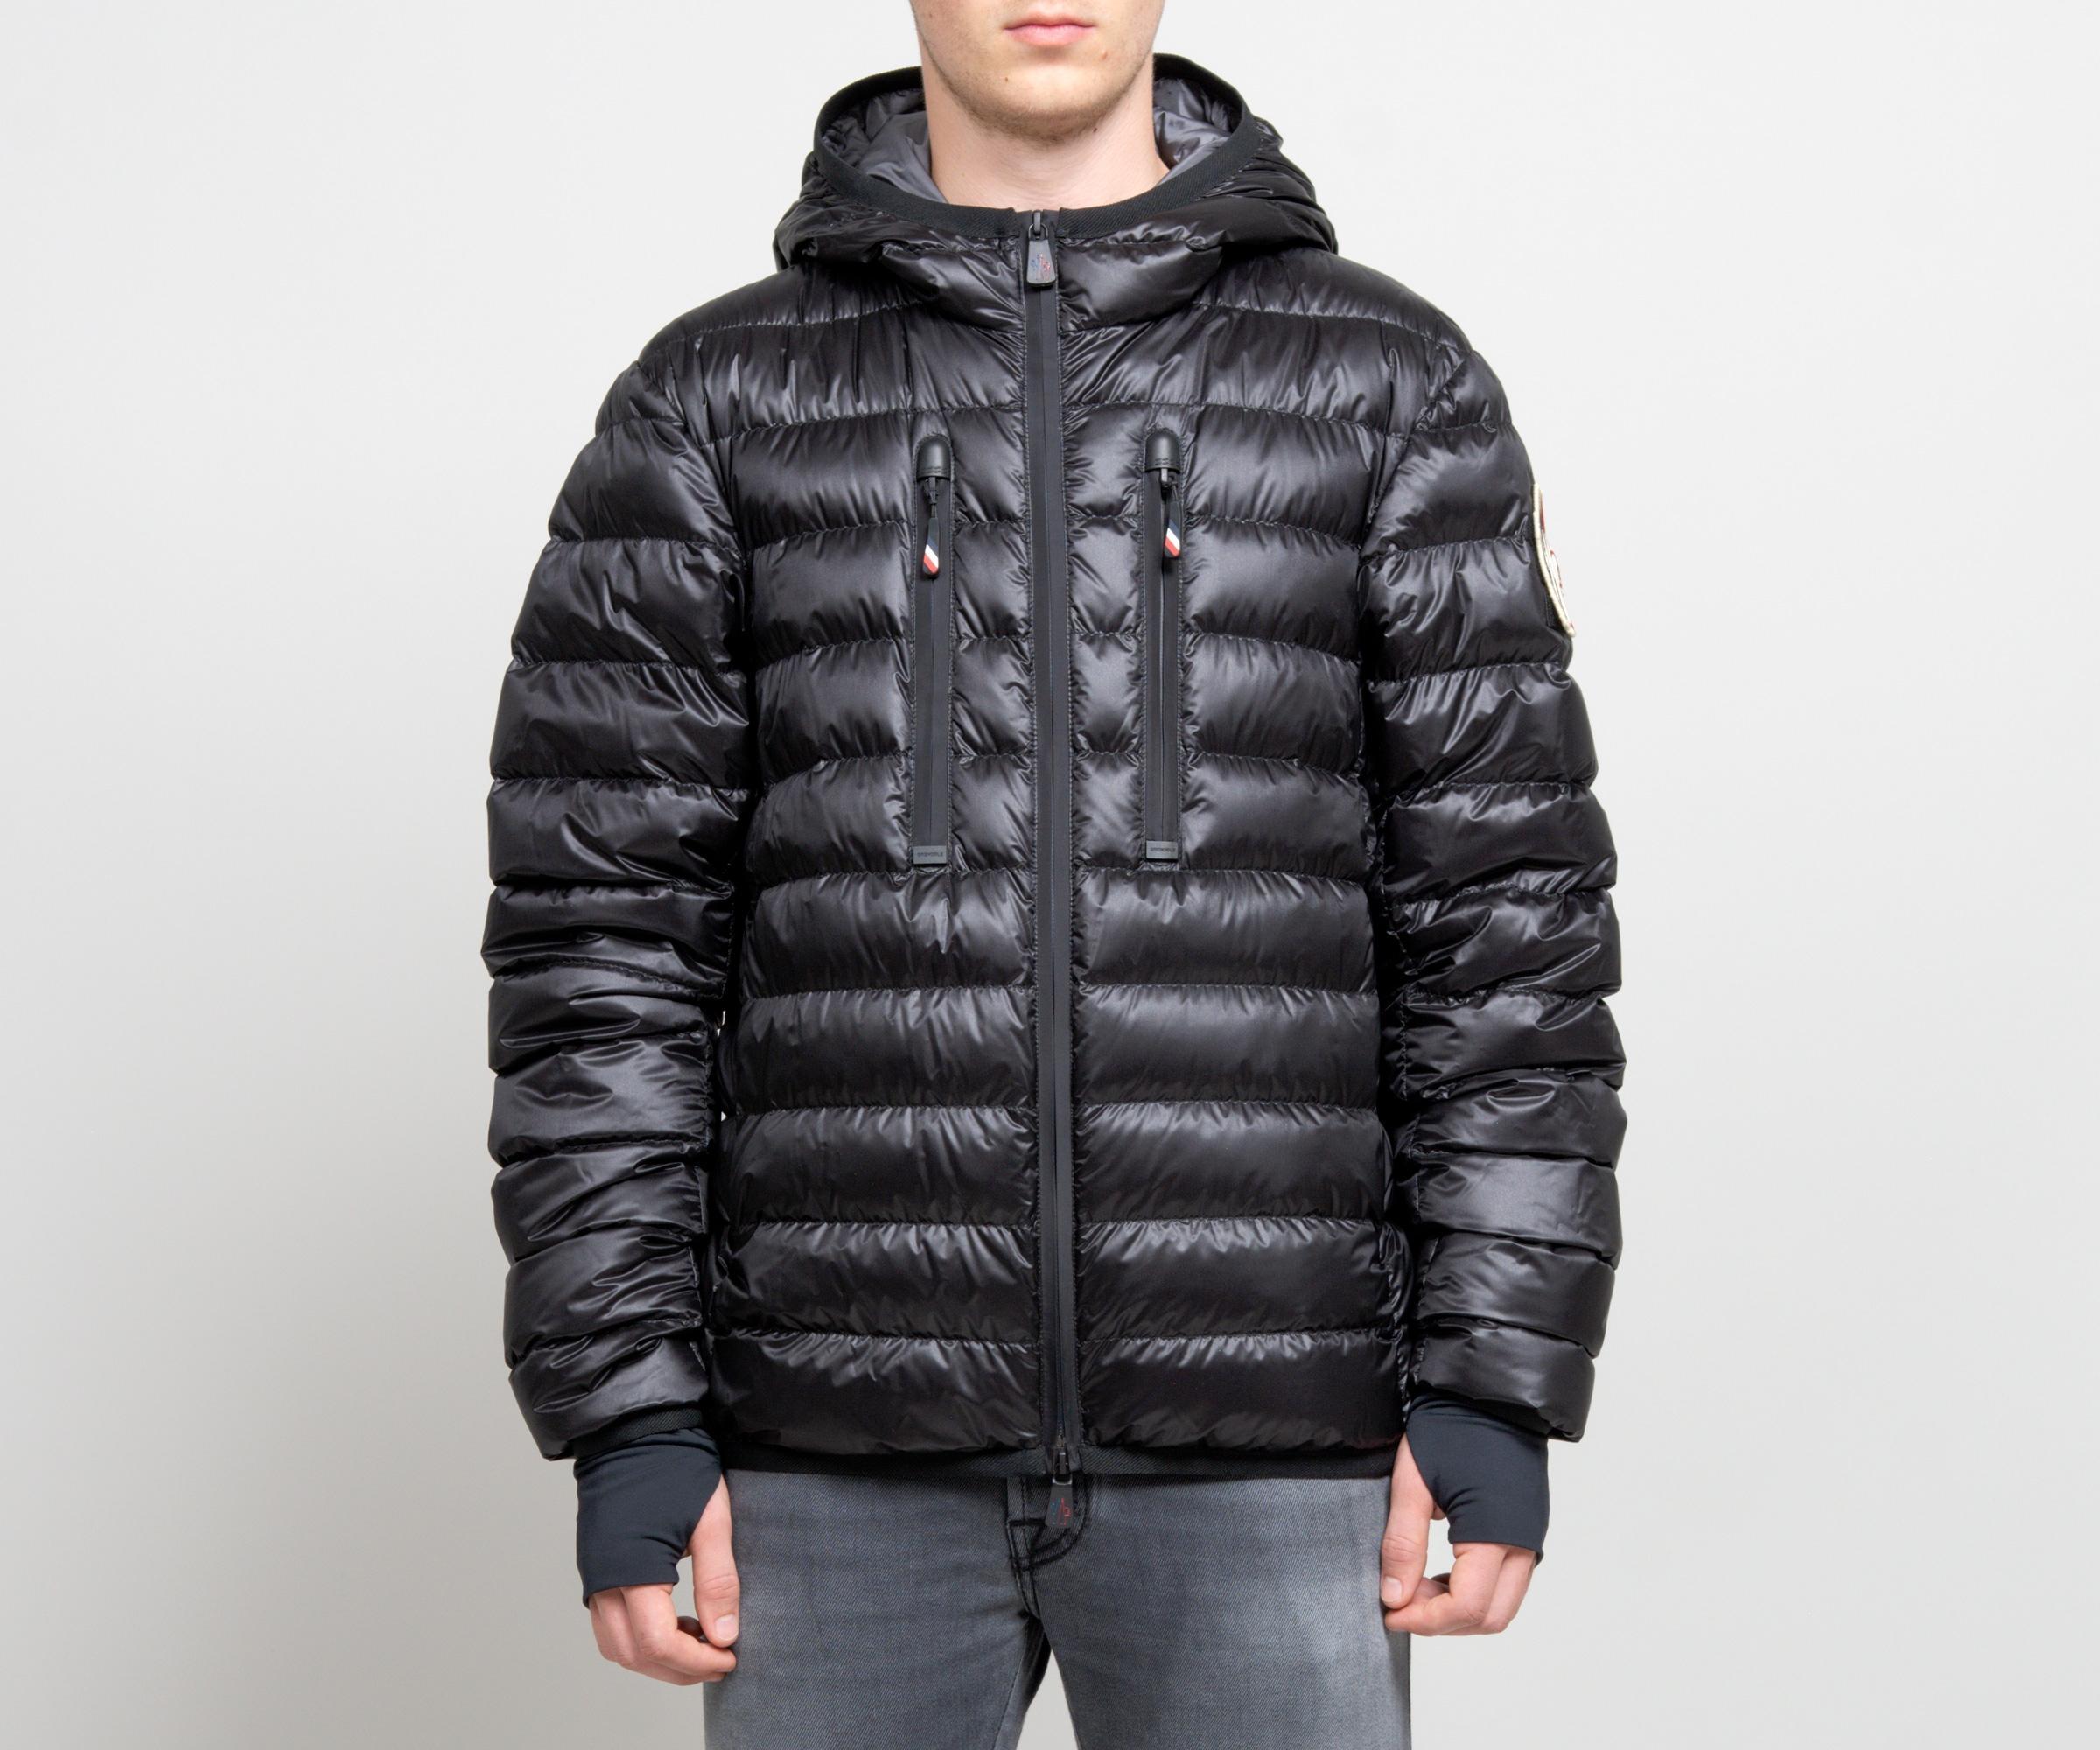 Grenoble 'kavik' Hooded Down Jacket Black